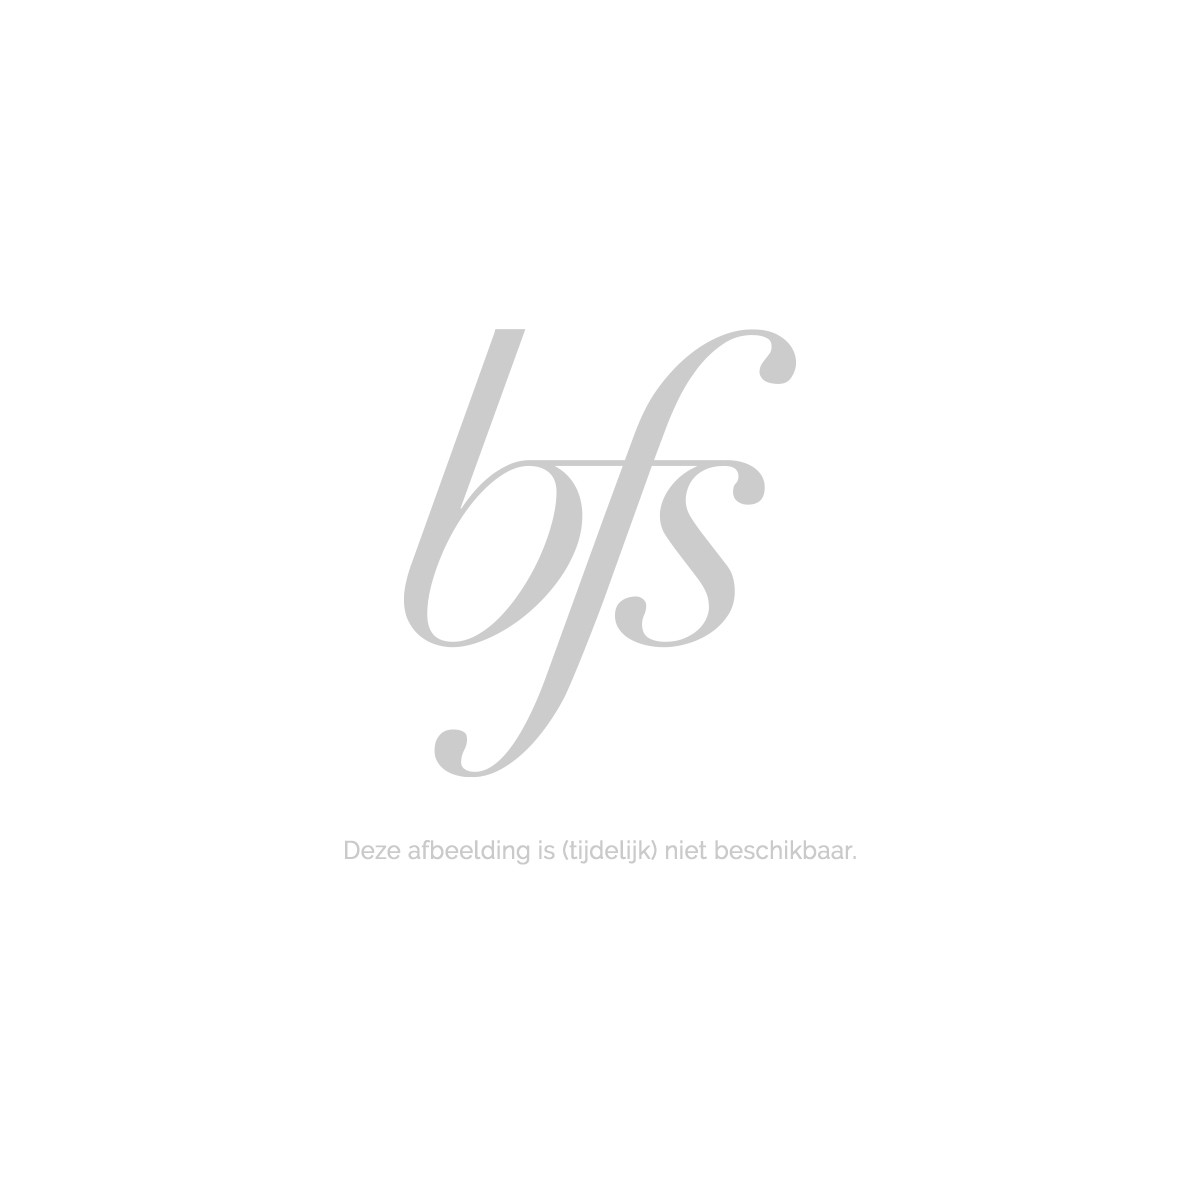 Christian Dior Diorshow Iconic Lash Curler Mascara 10 Ml